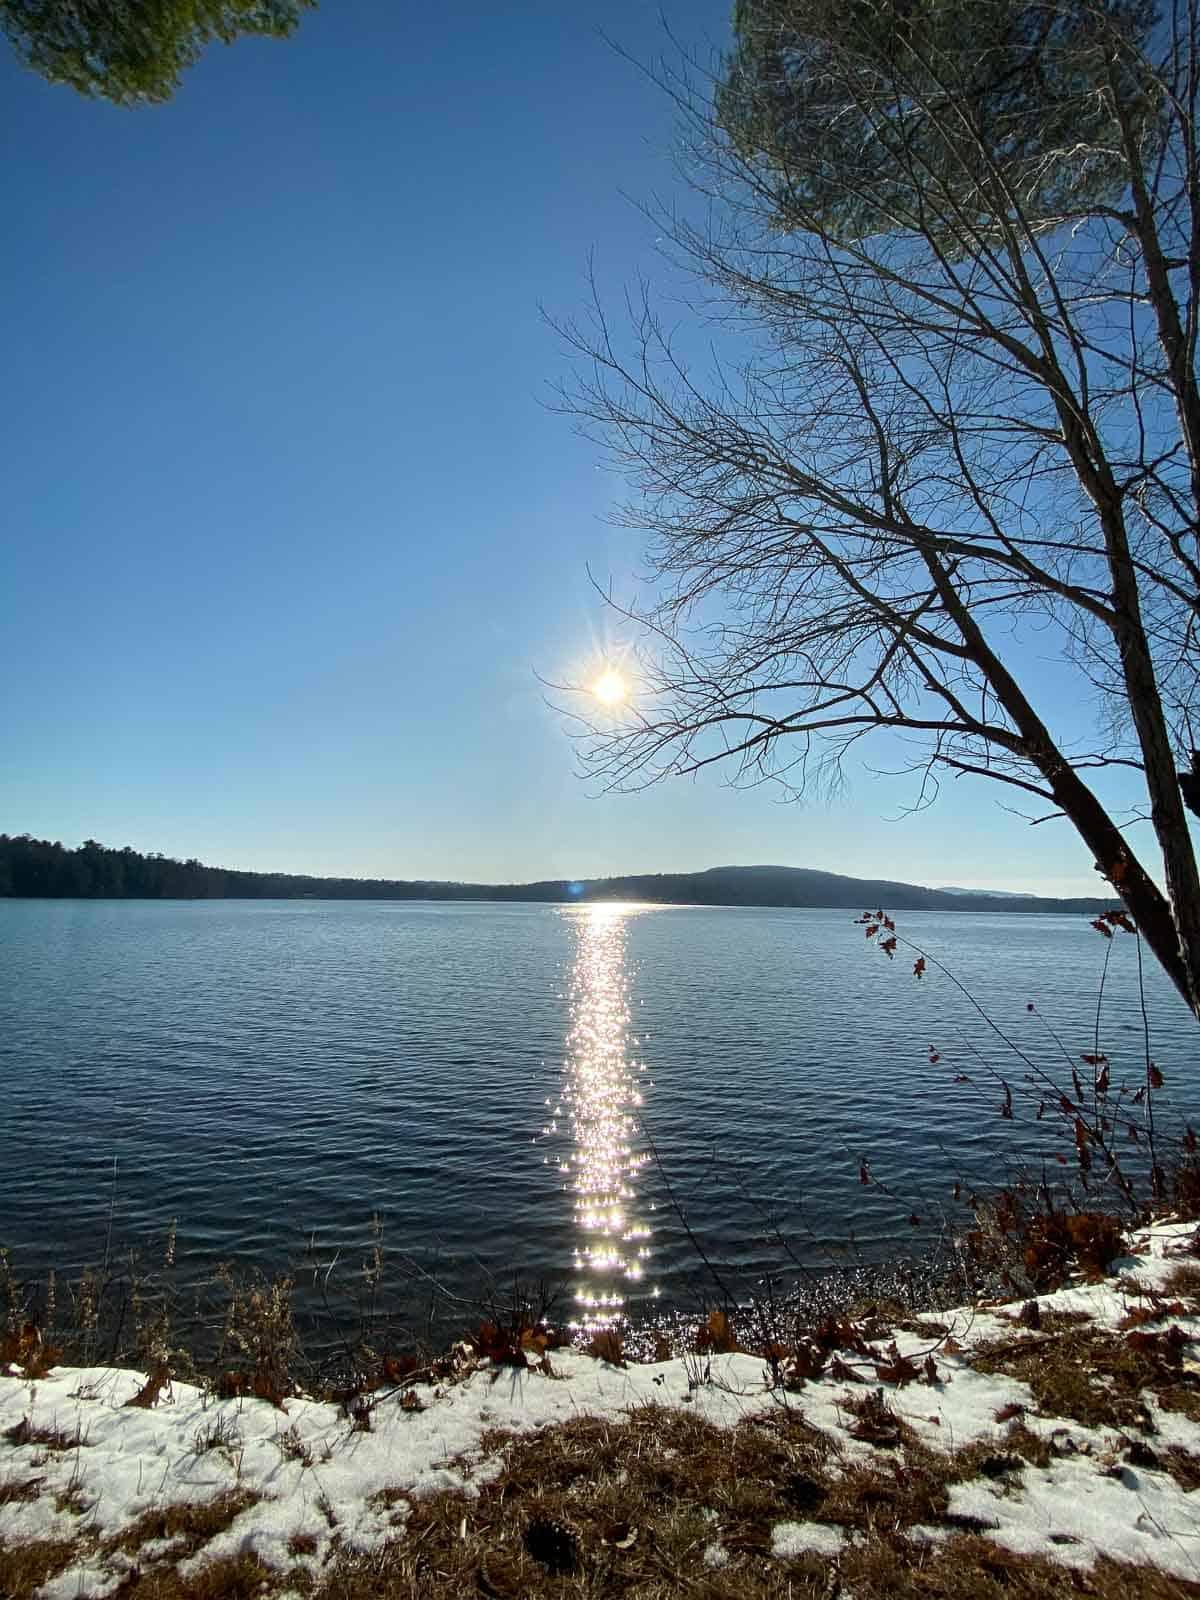 sunny day on the Kripalu lake